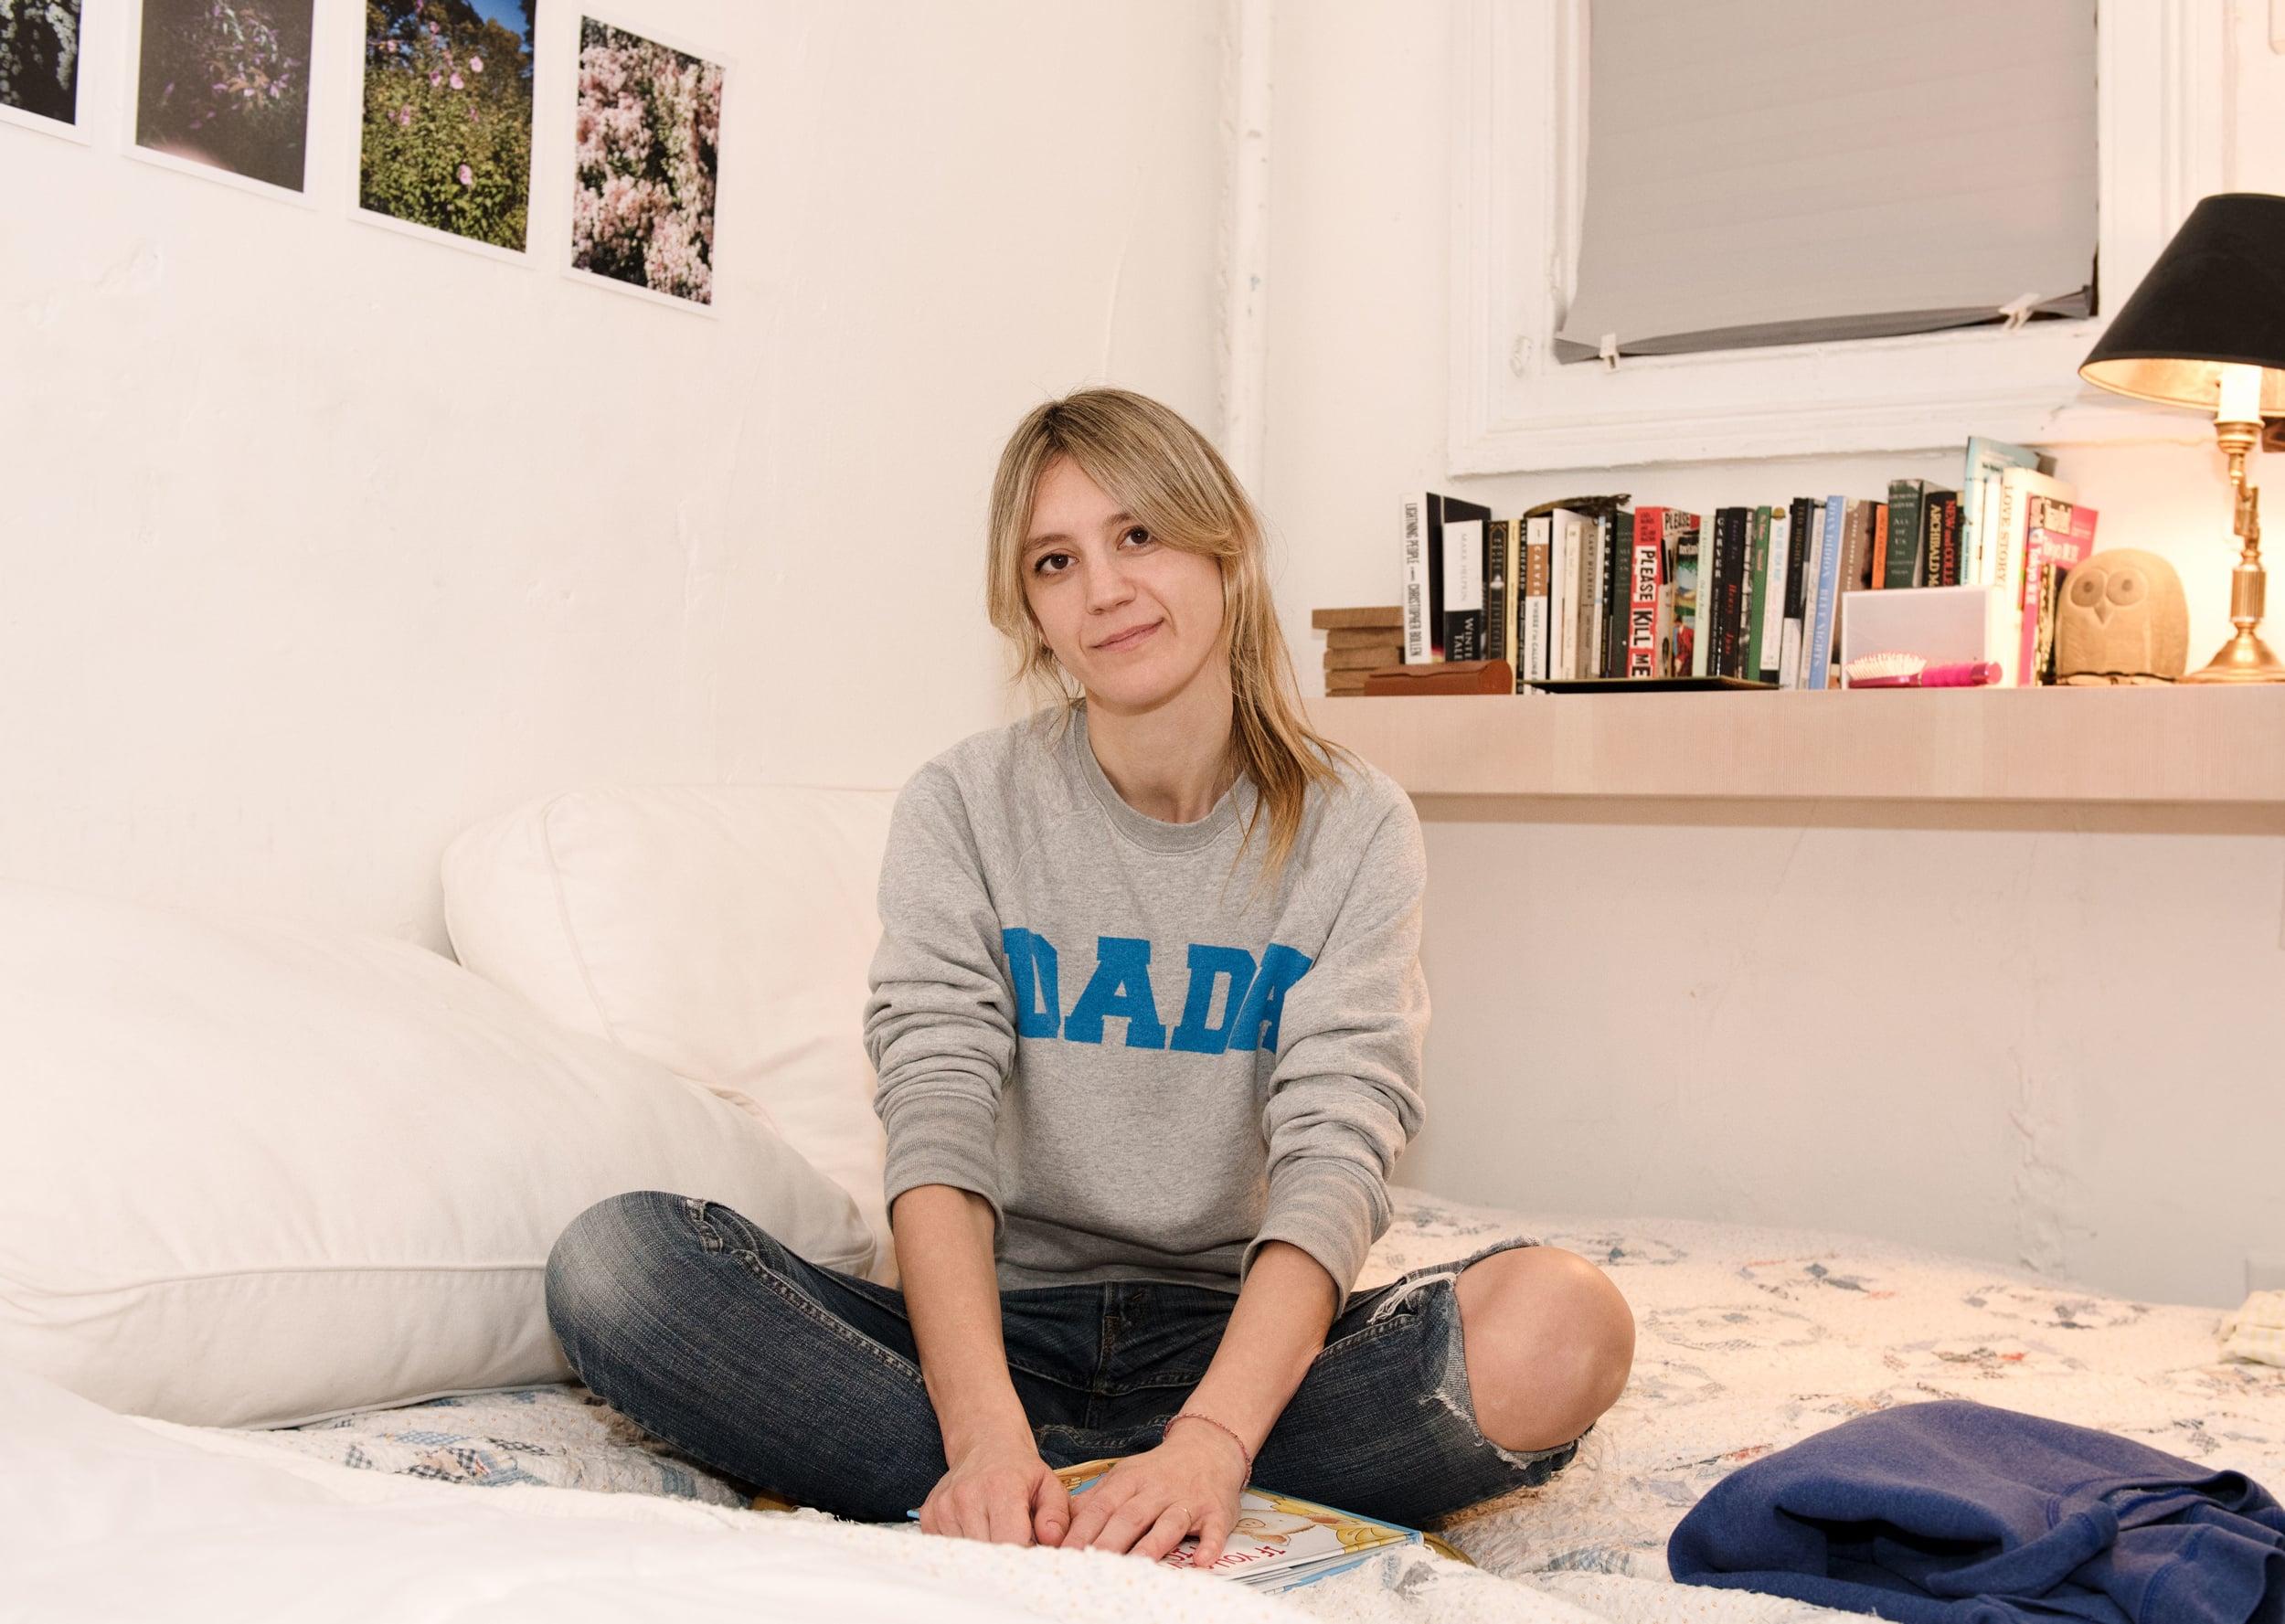 Frances Tulk-Hart, photographer, in her Greenpoint home.